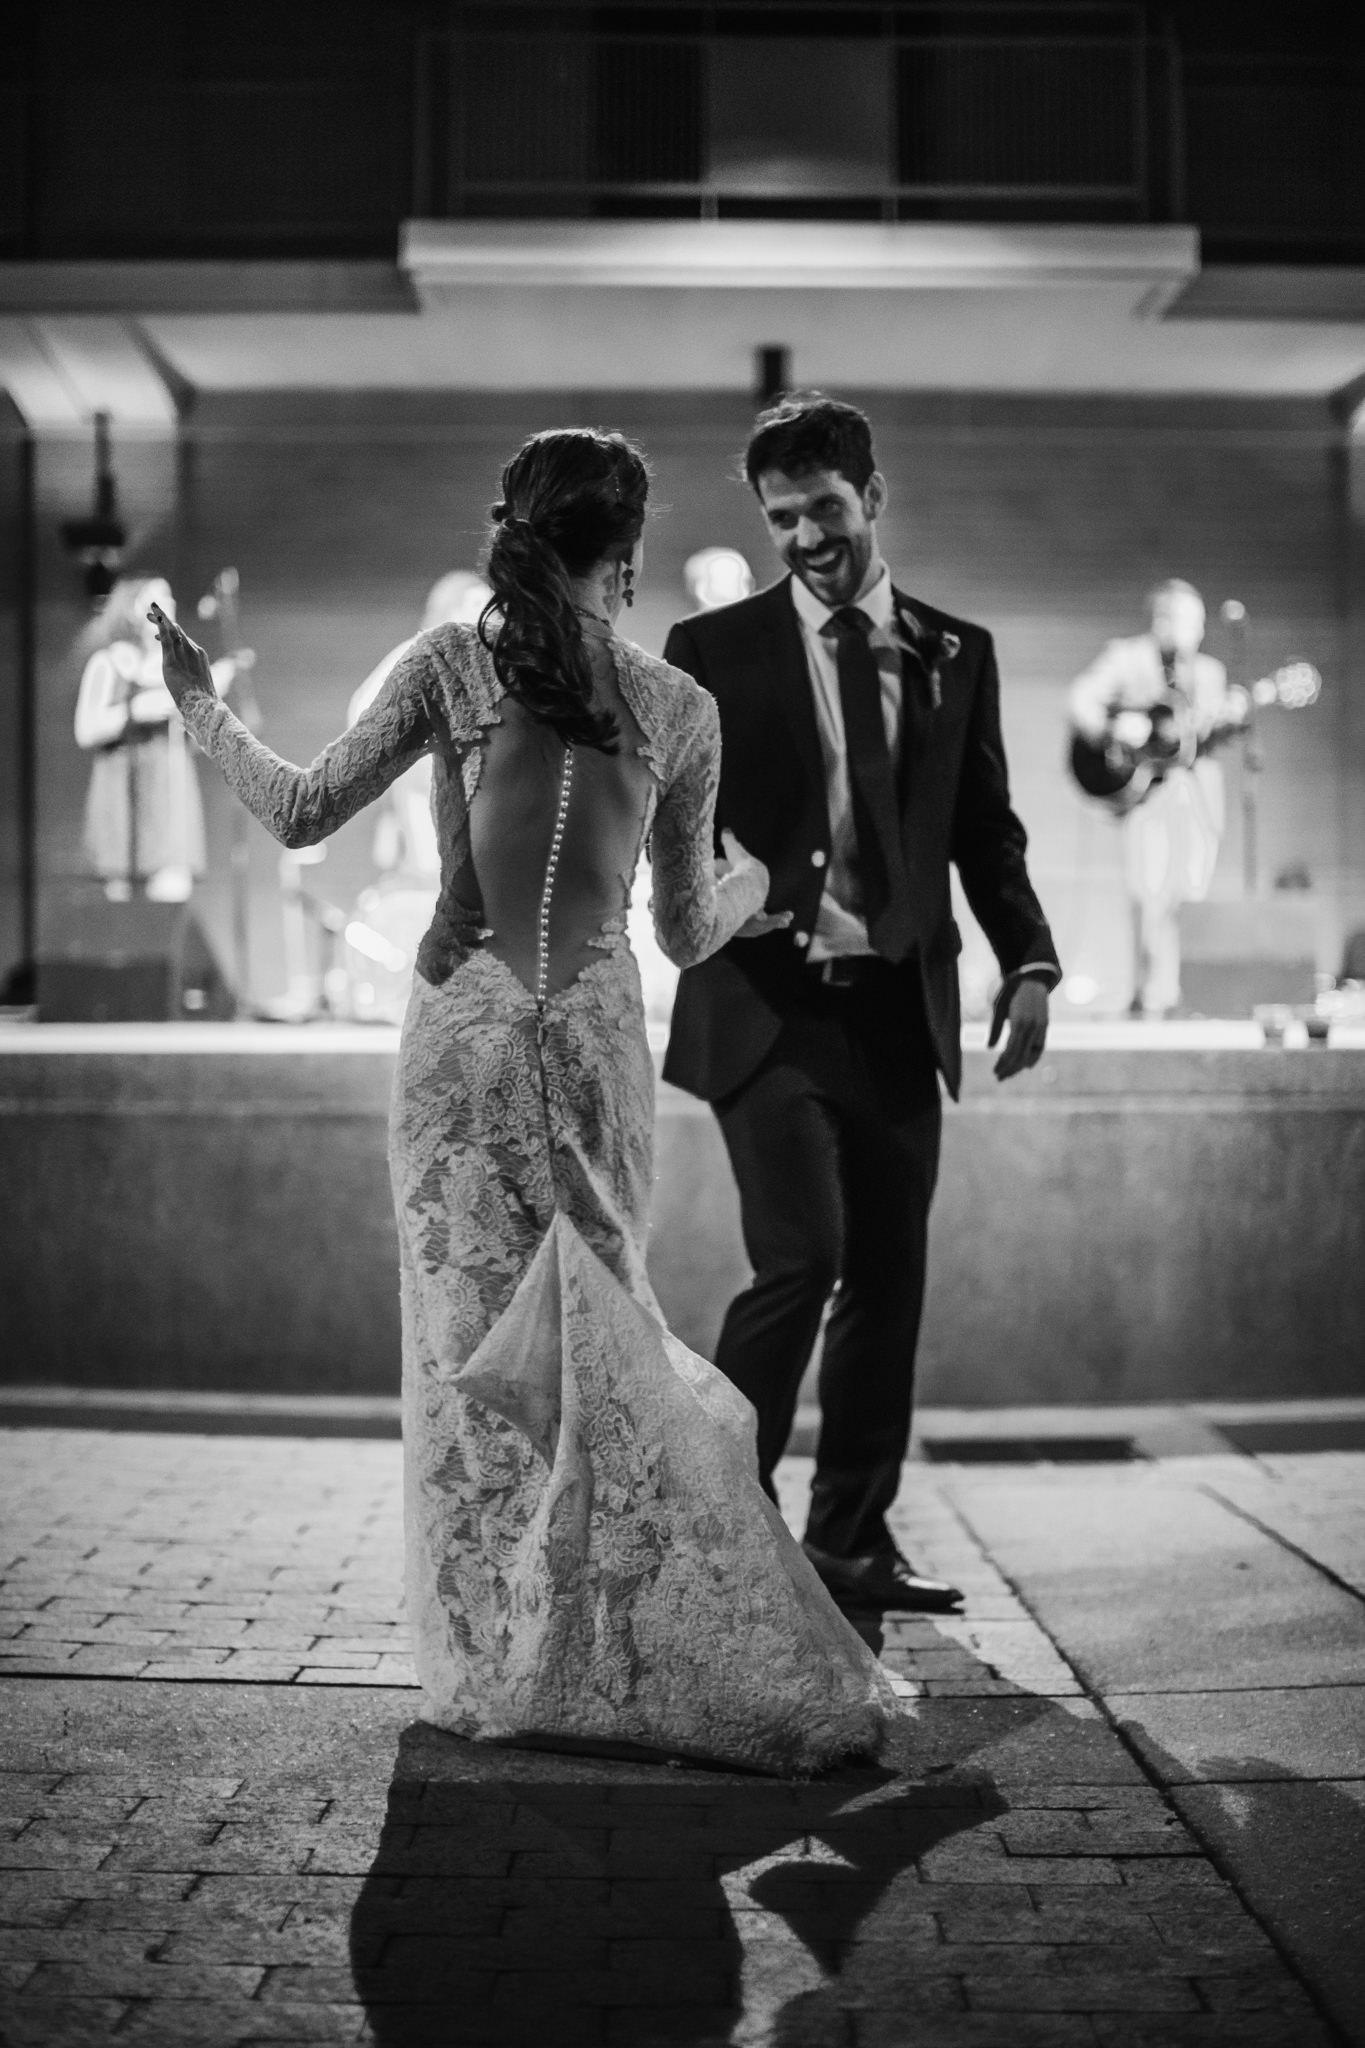 cassie-cook-photography-chattanooga-wedding-photographer-waterhouse-pavillion-cassie-matt-wedding-120.jpg